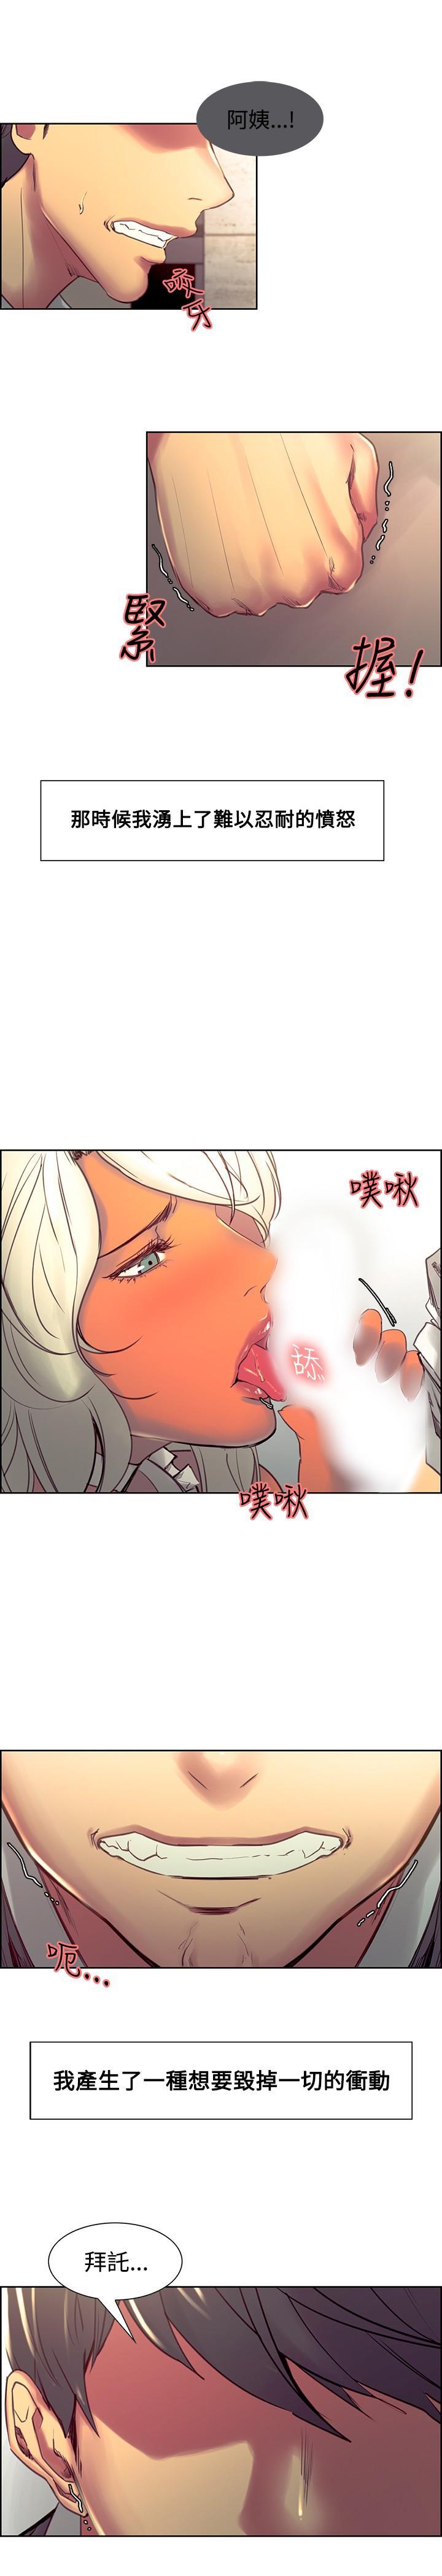 Domesticate the Housekeeper 调教家政妇 ch.29-32 59